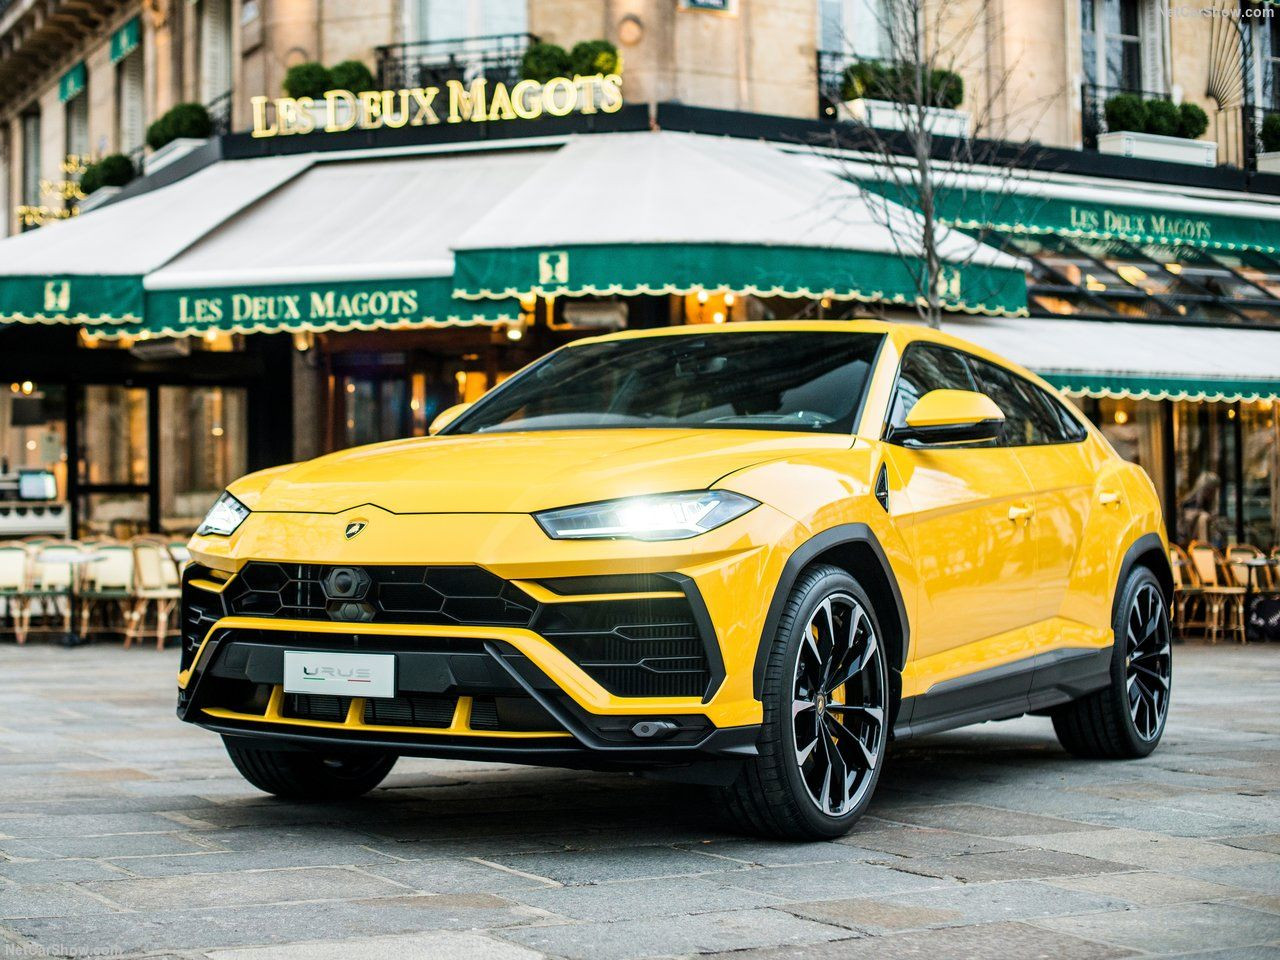 Lamborghini Urus 2019 - Page 1